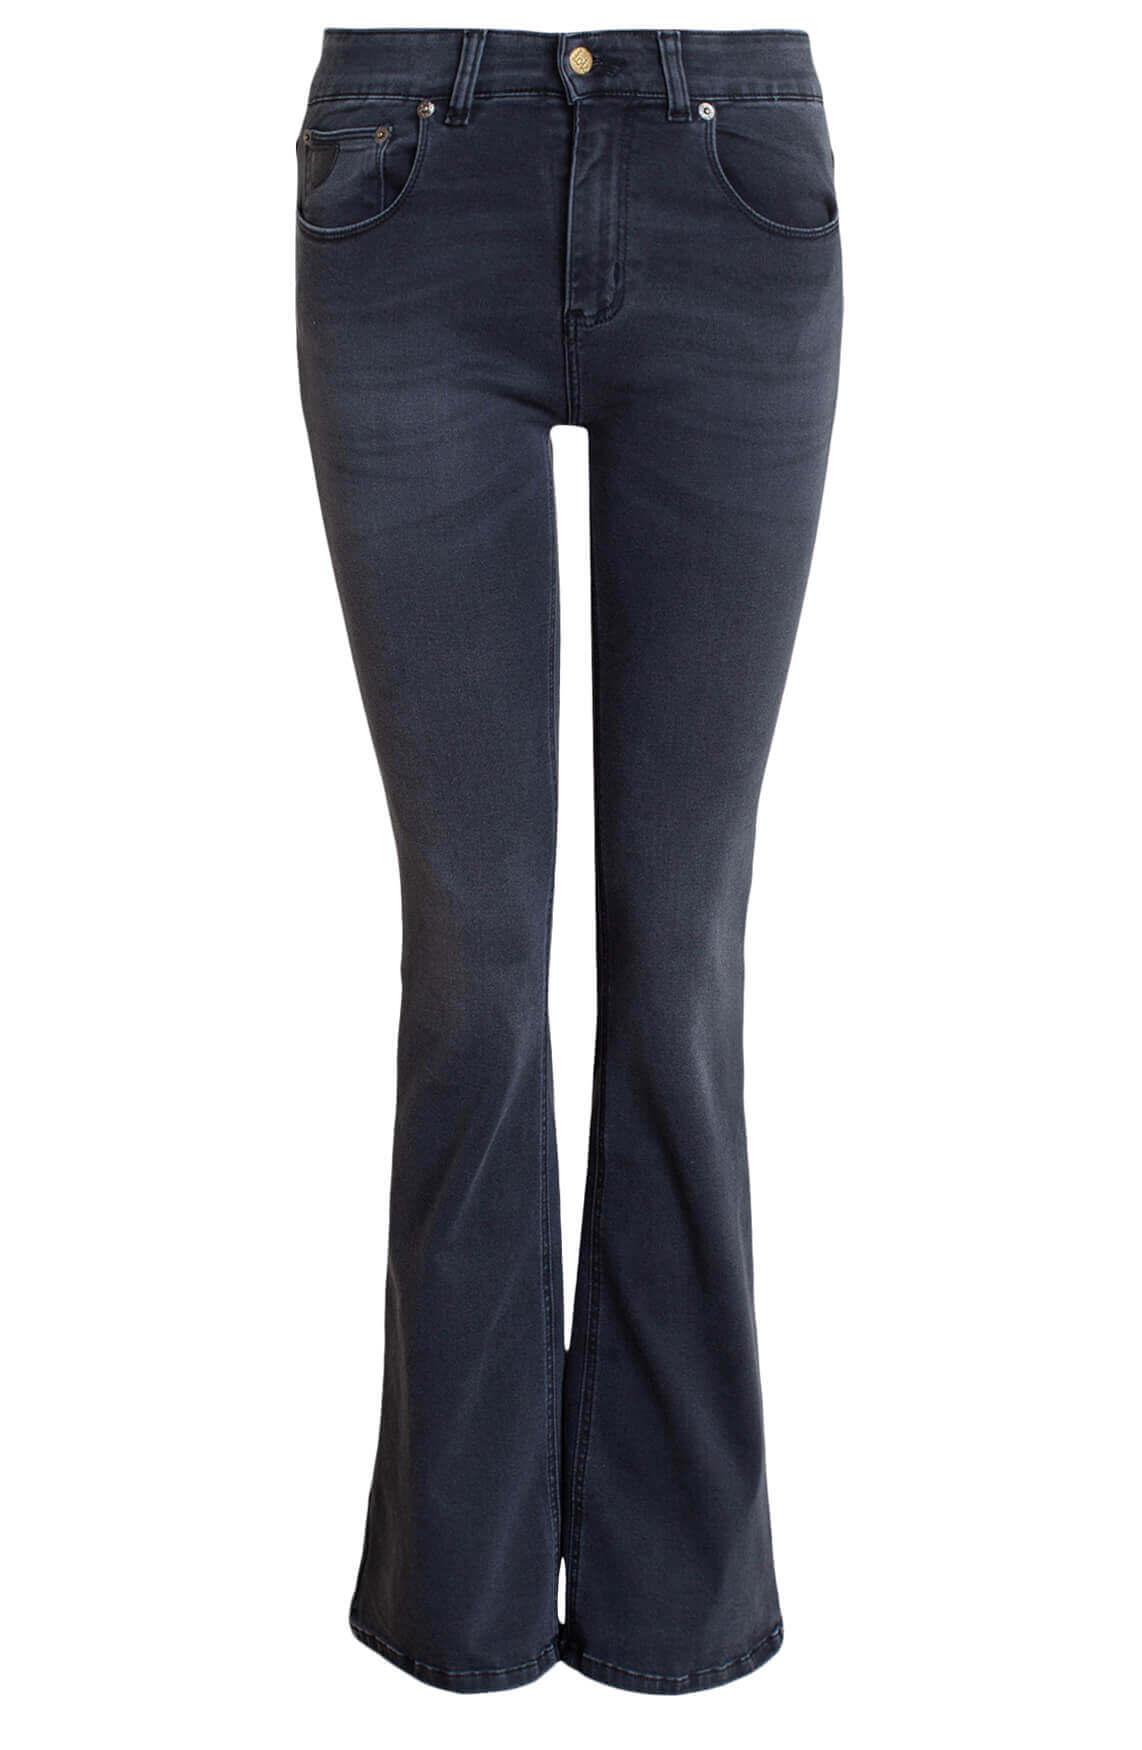 Lois Dames L34 Melrose jeans Zwart